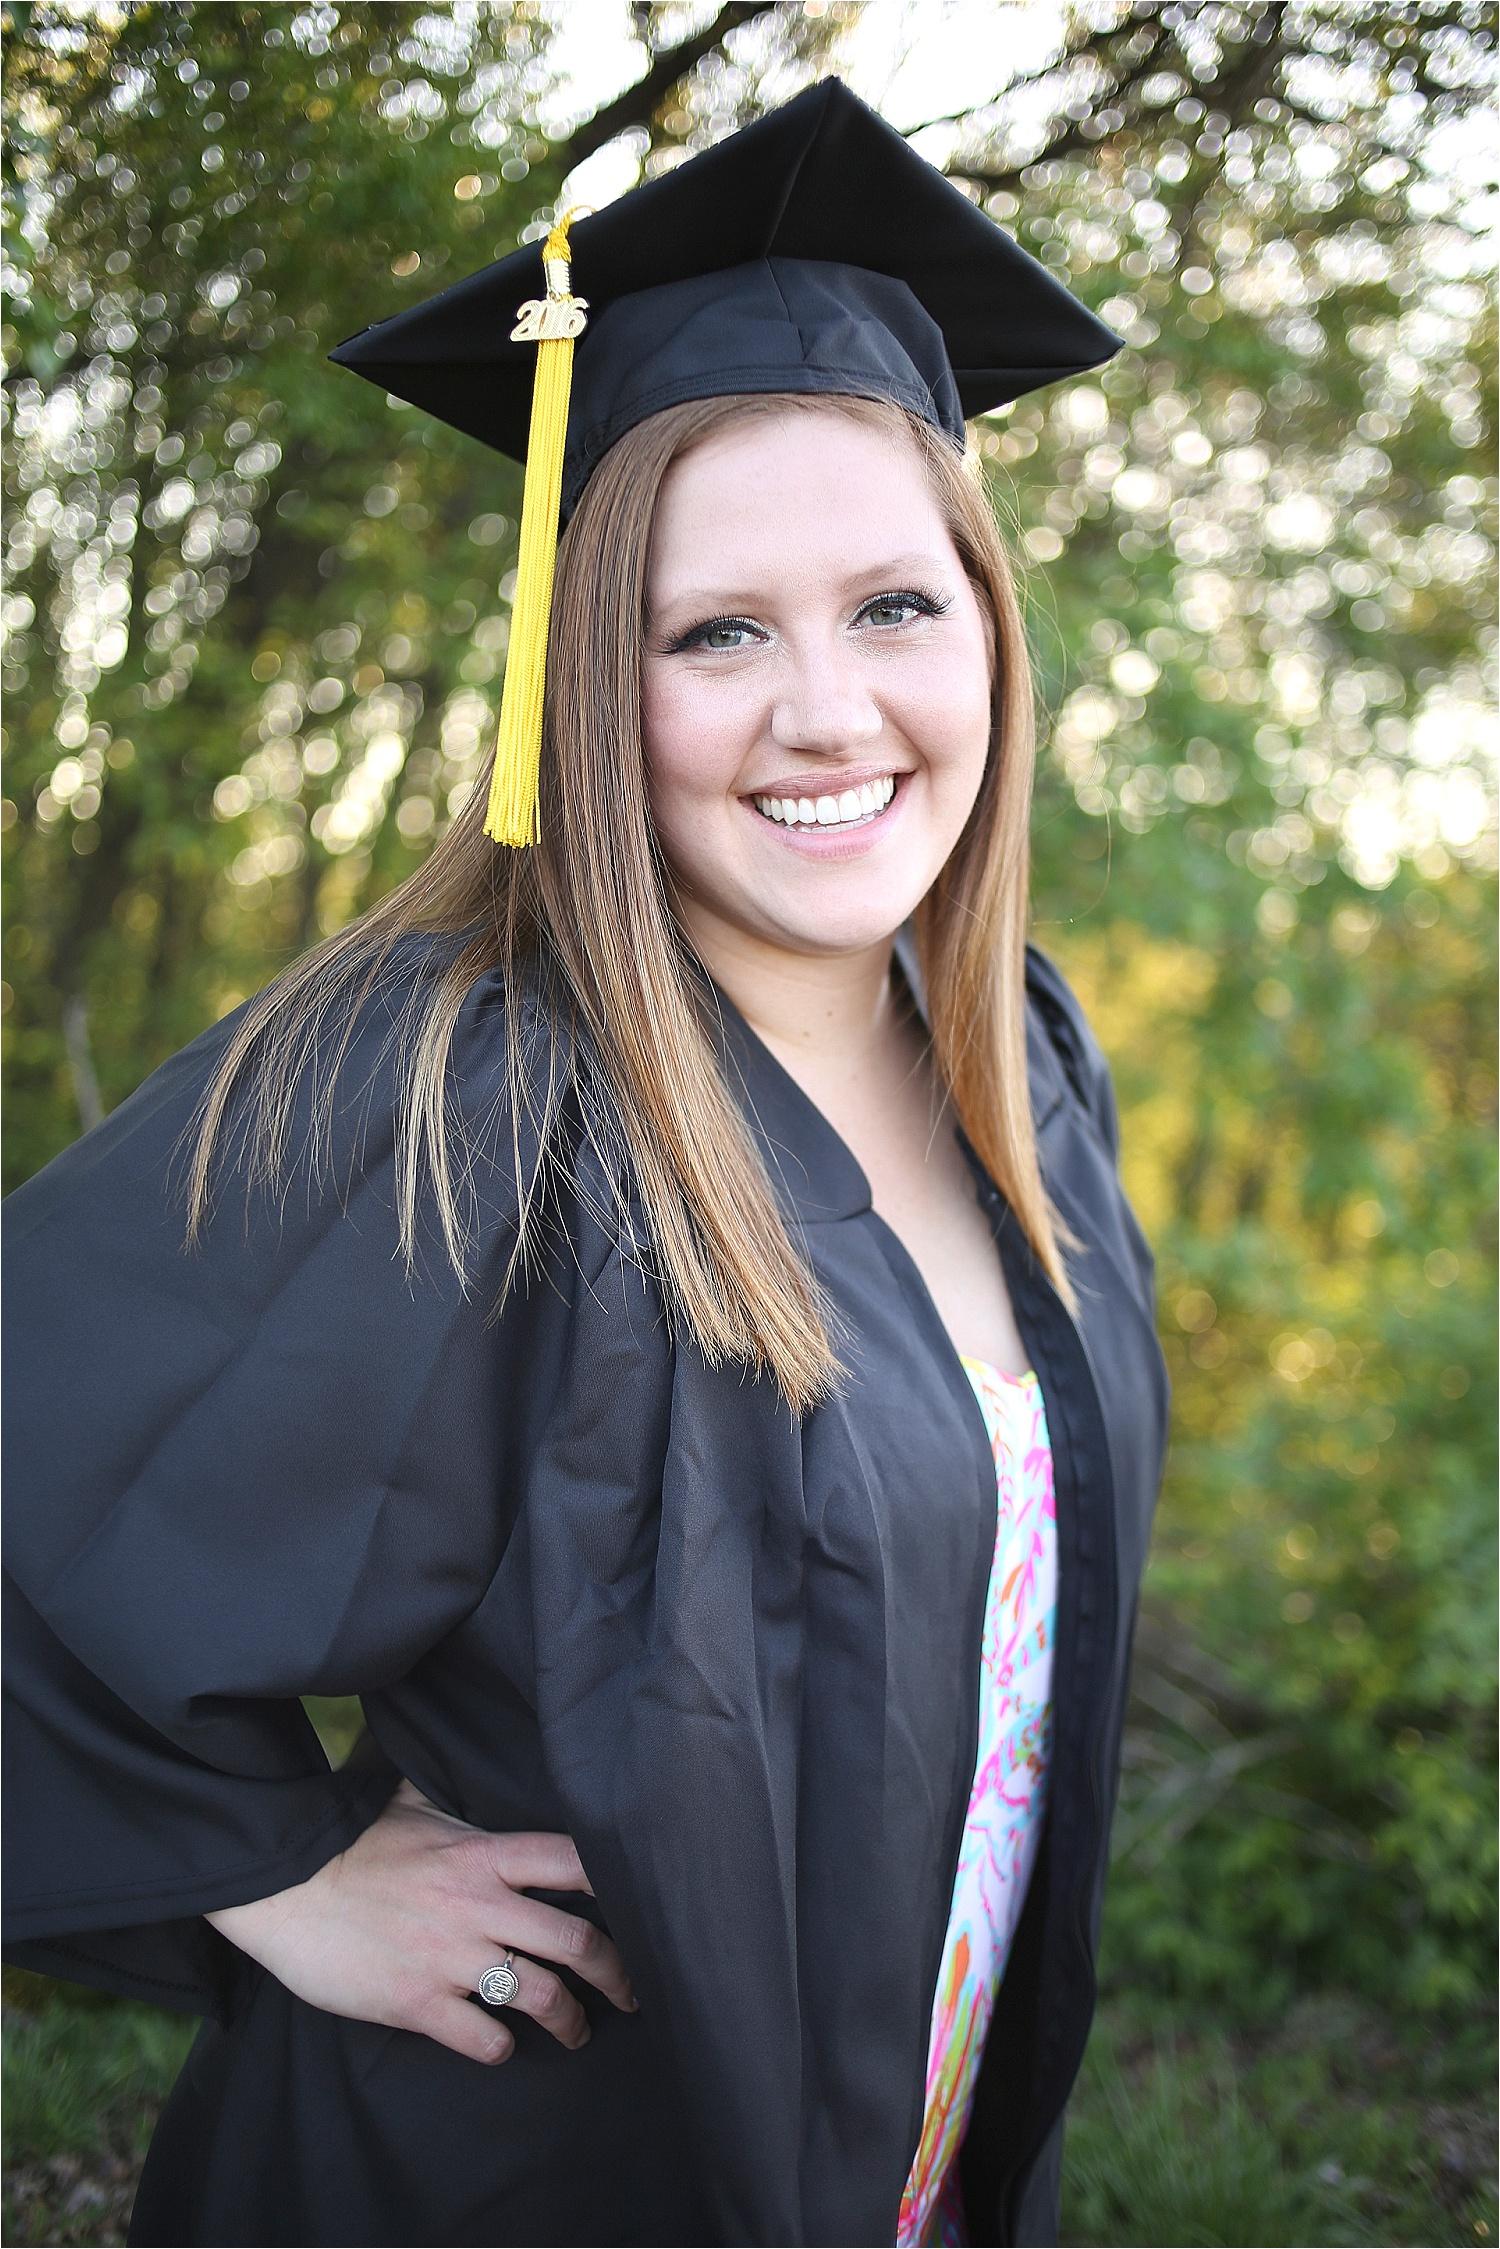 Blacksburg-Senior-Portrait-Photographer-Nursing-School-Graduation-Photos-_0016.jpg